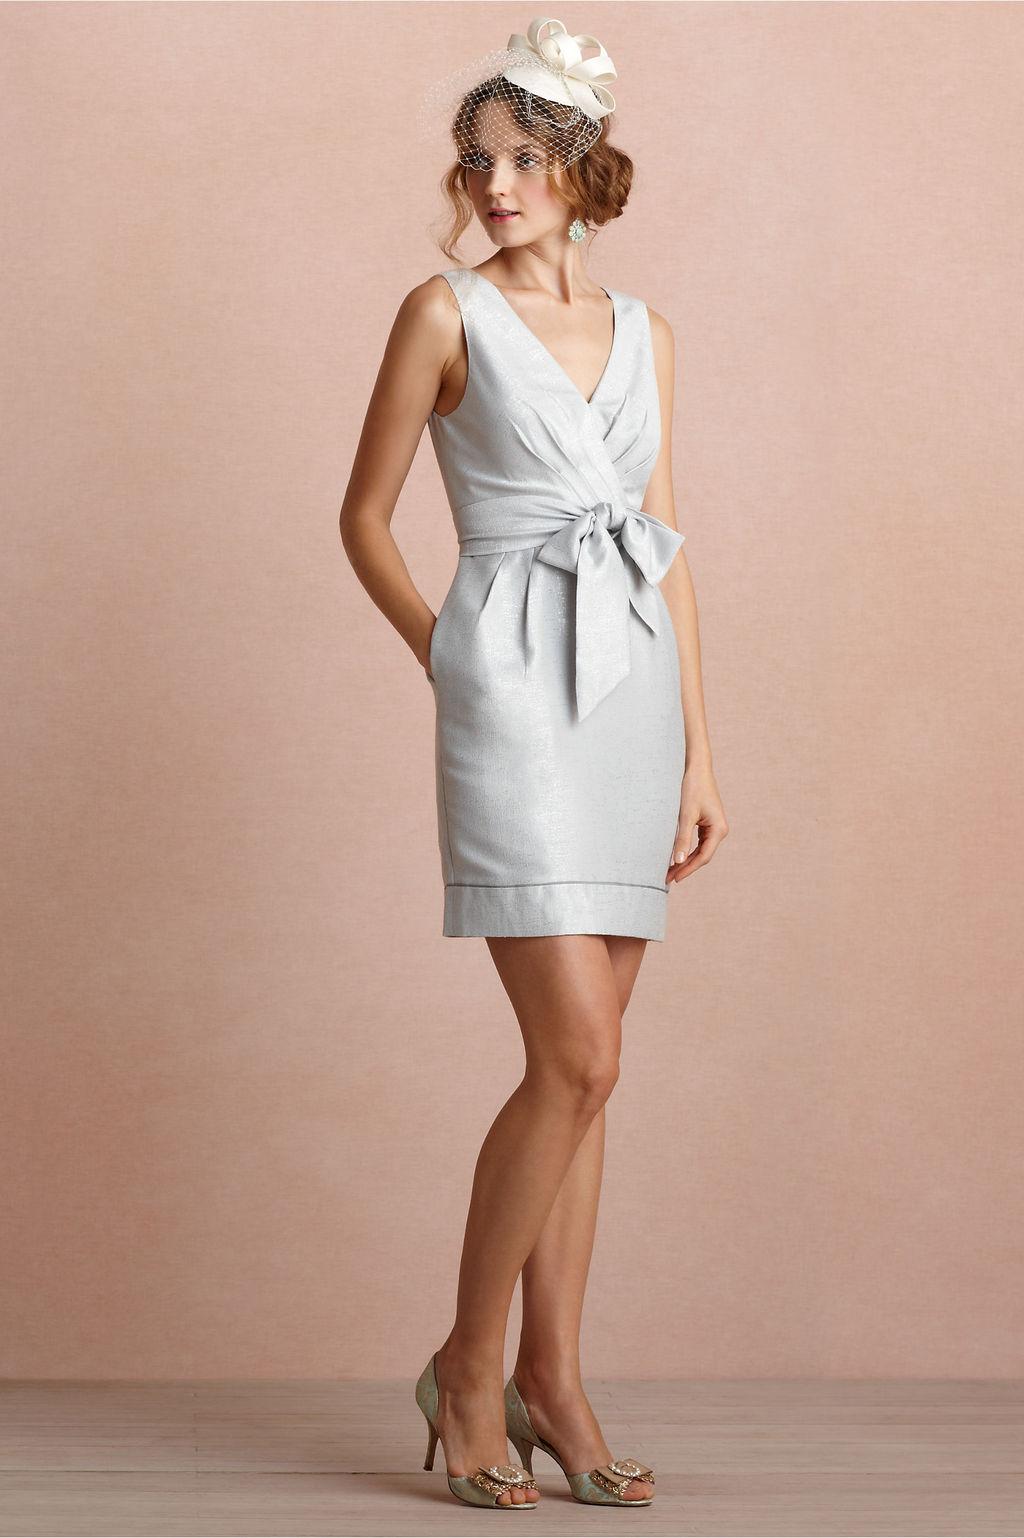 2013-bridesmaid-dress-ideas-bhldn-frocks.full